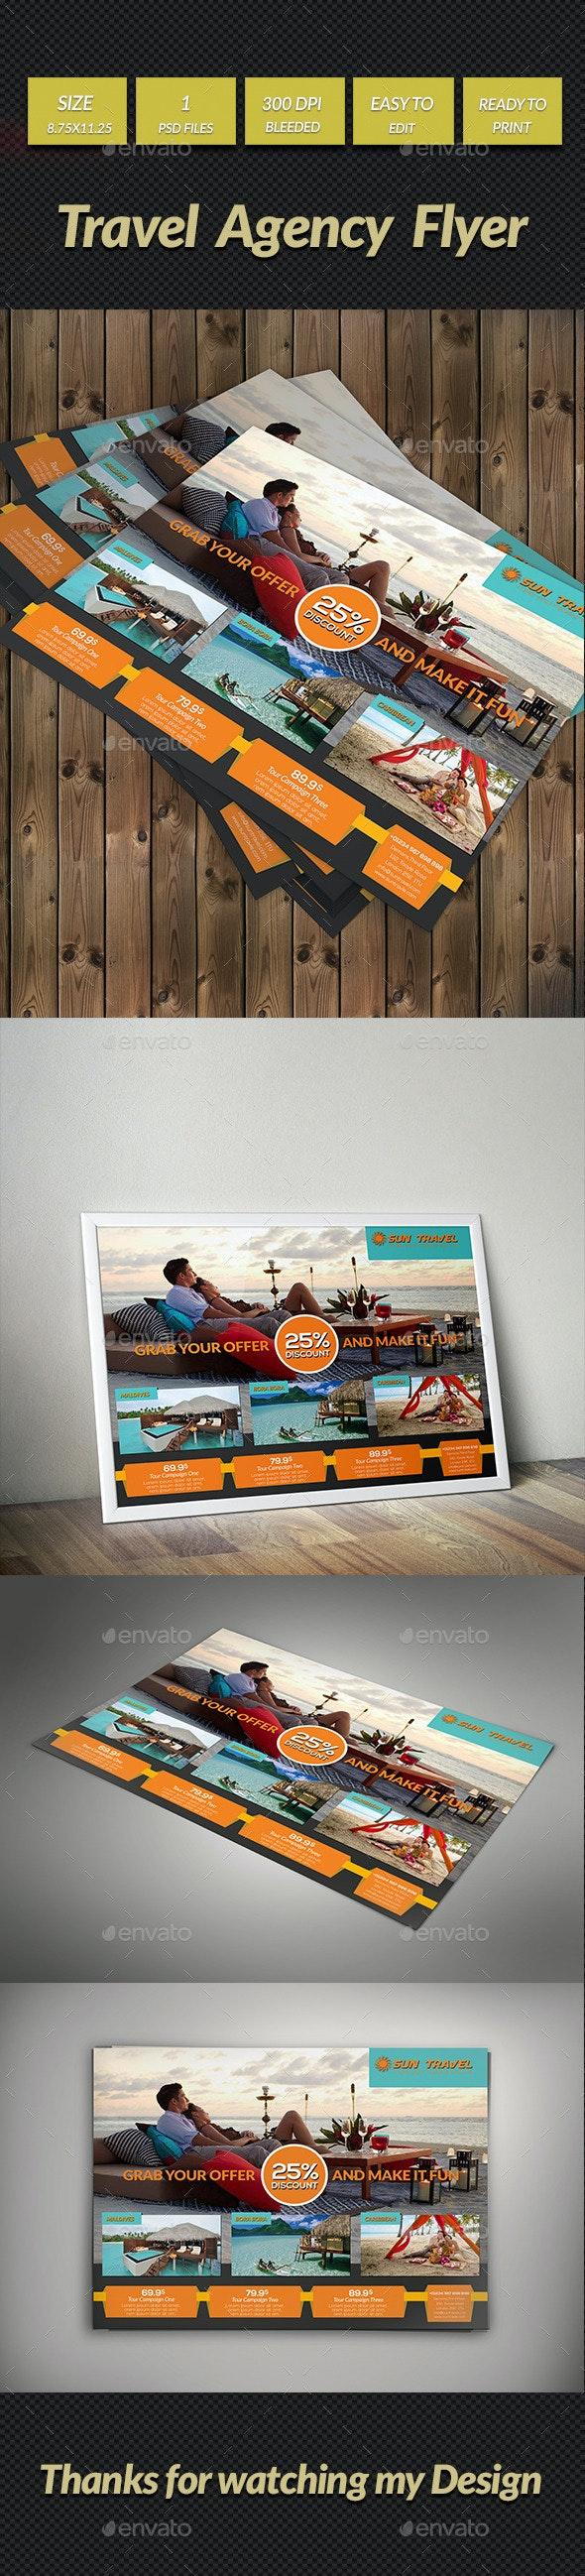 Travel Agency Flyer (Horizontal) - Commerce Flyers